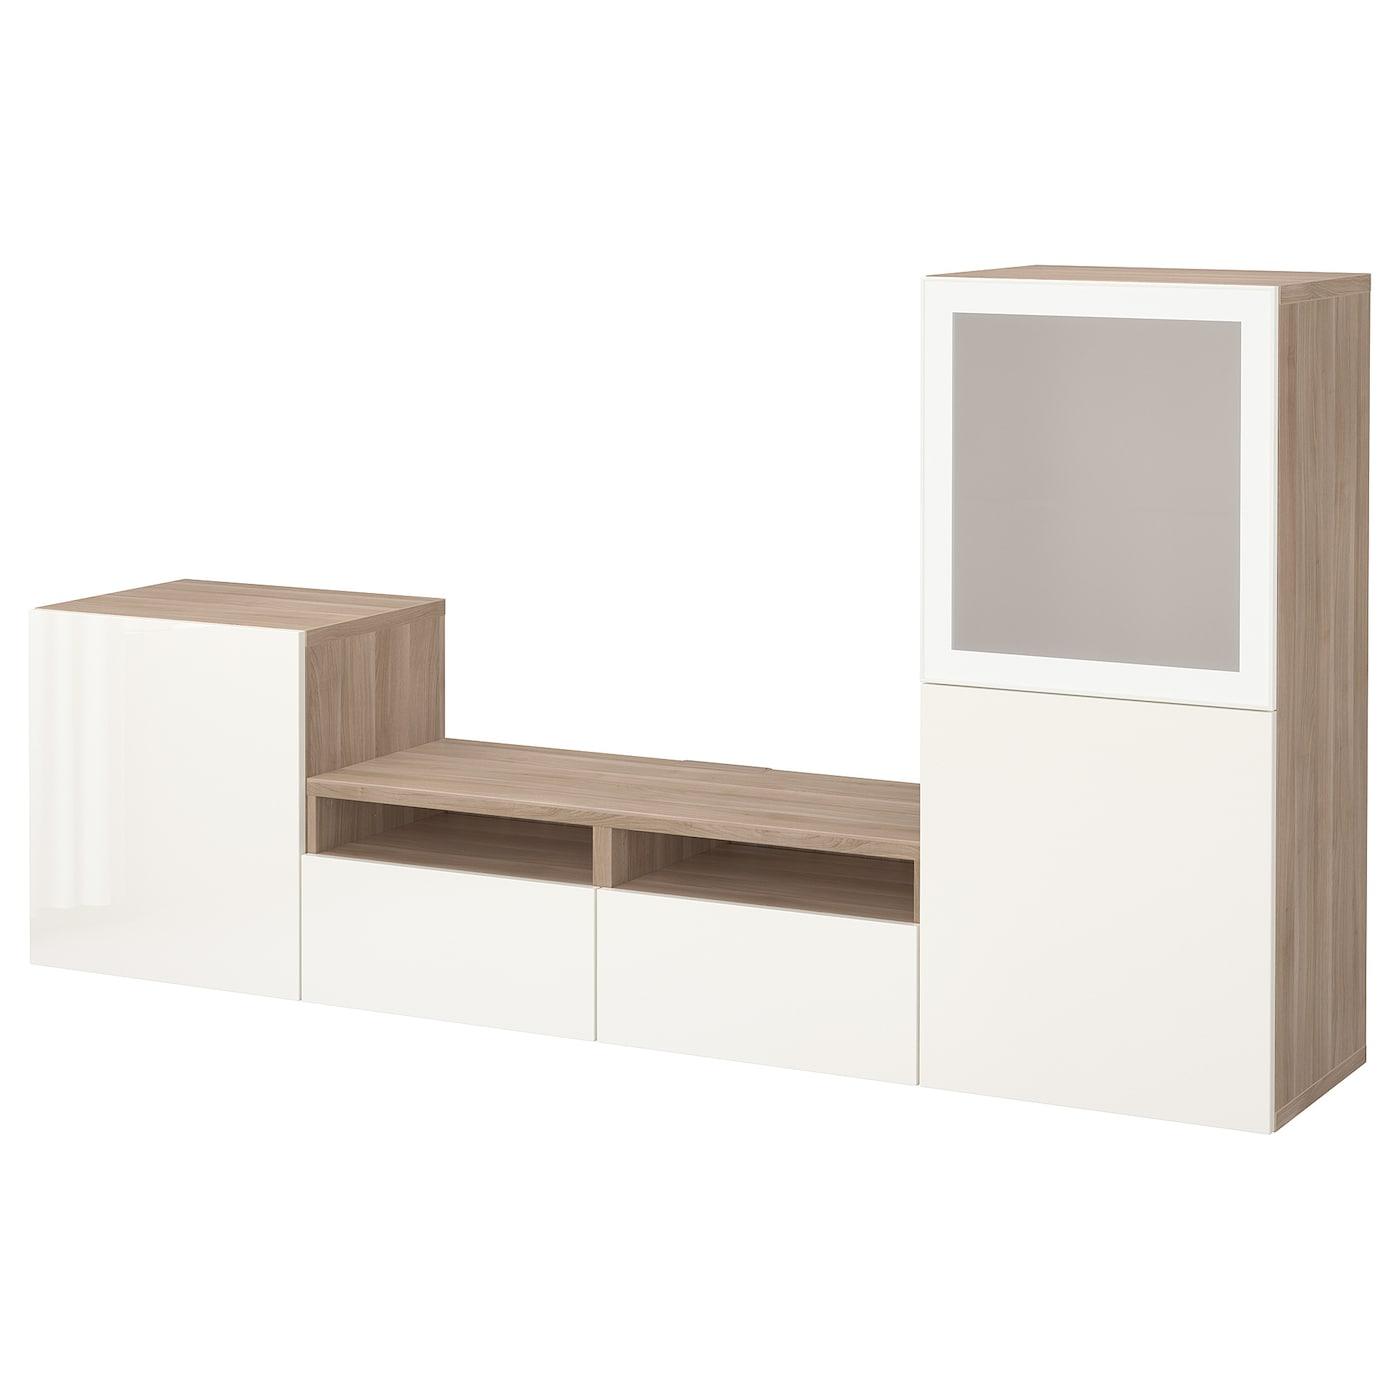 bestÅ combinaison rangt tv/vitrines motif noyer teinté gris